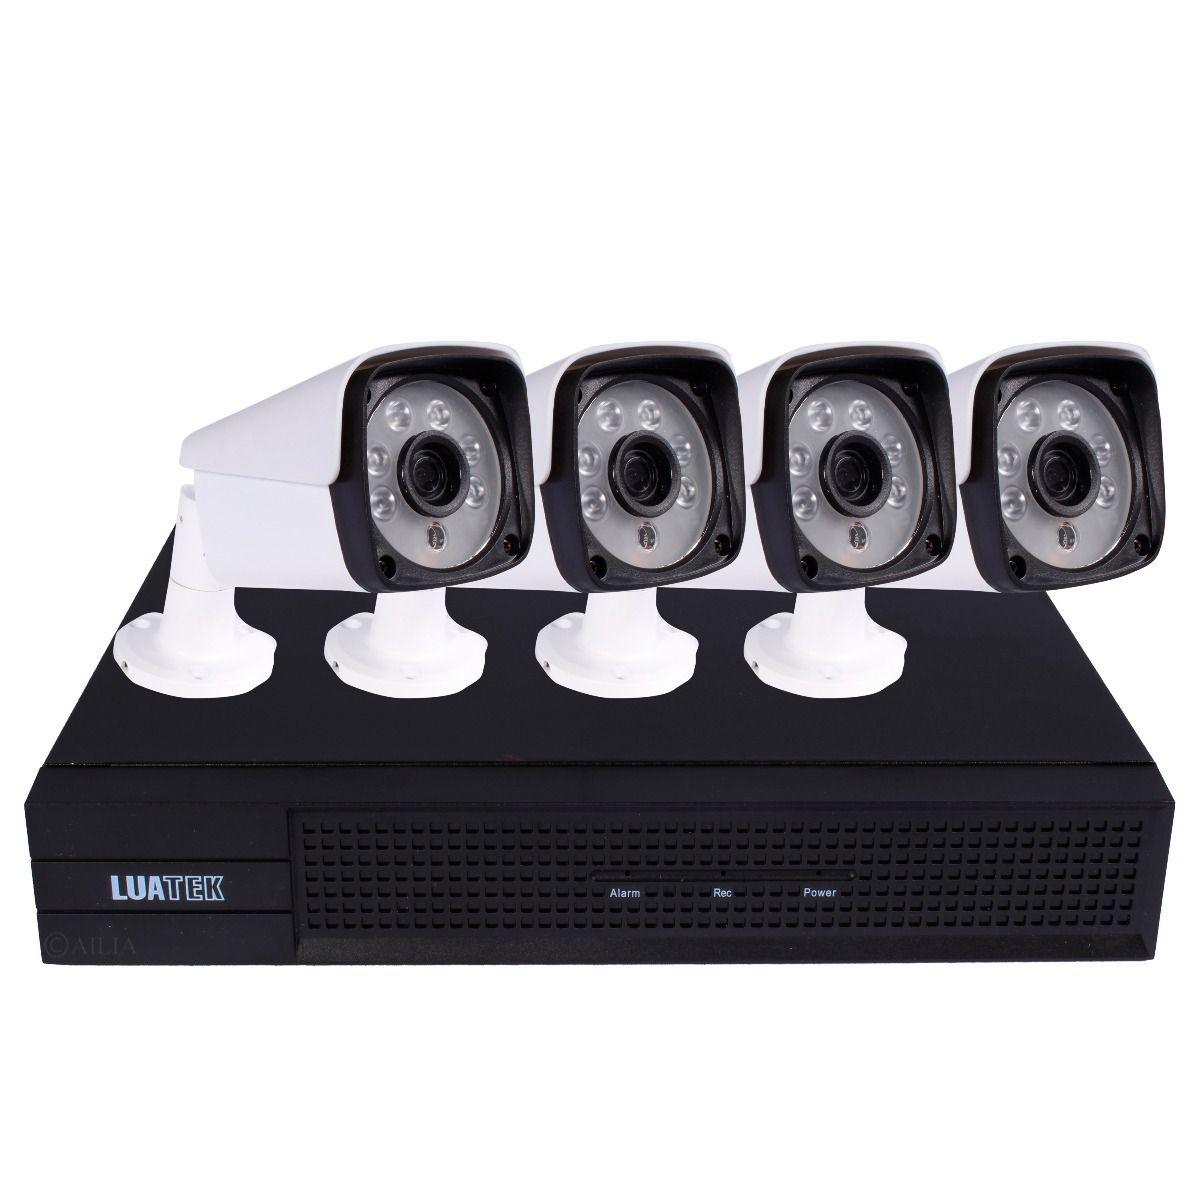 Kit Nvr Com 4 Cameras Ip Bullet Poe 2mp (1080p) 3.6mm Luatek